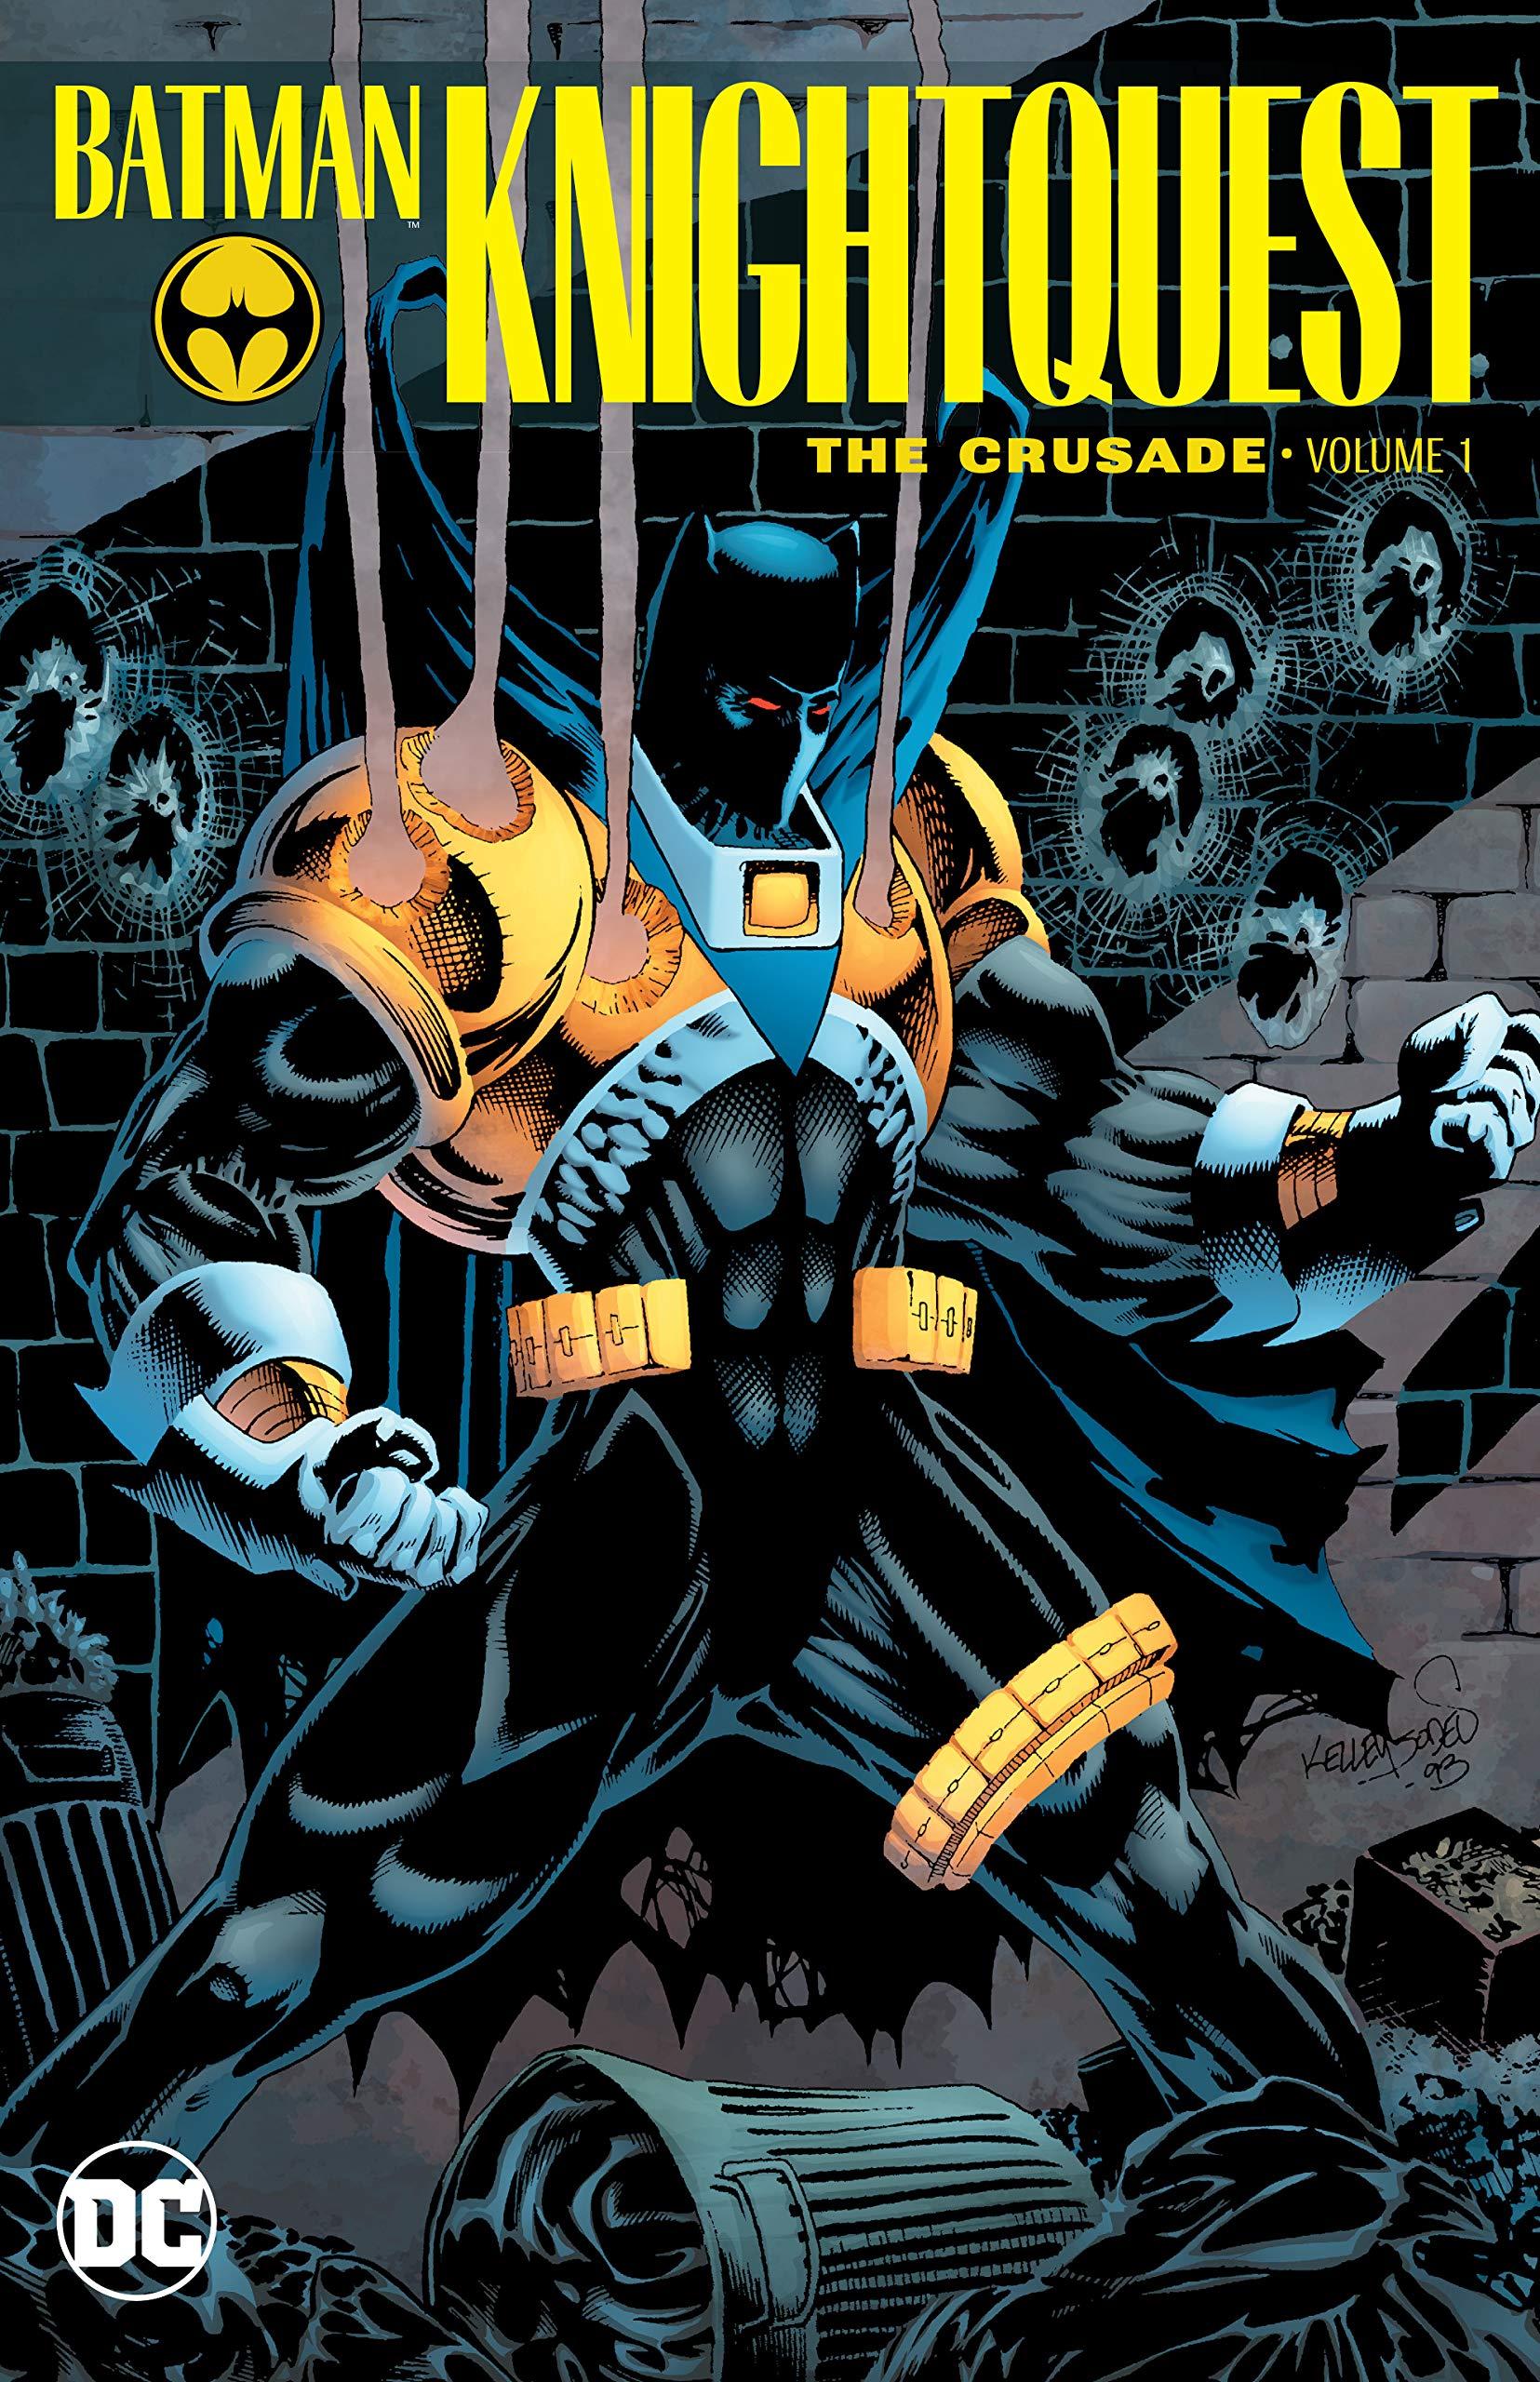 Download Batman: Knightquest: The Crusade Vol. 1 pdf epub